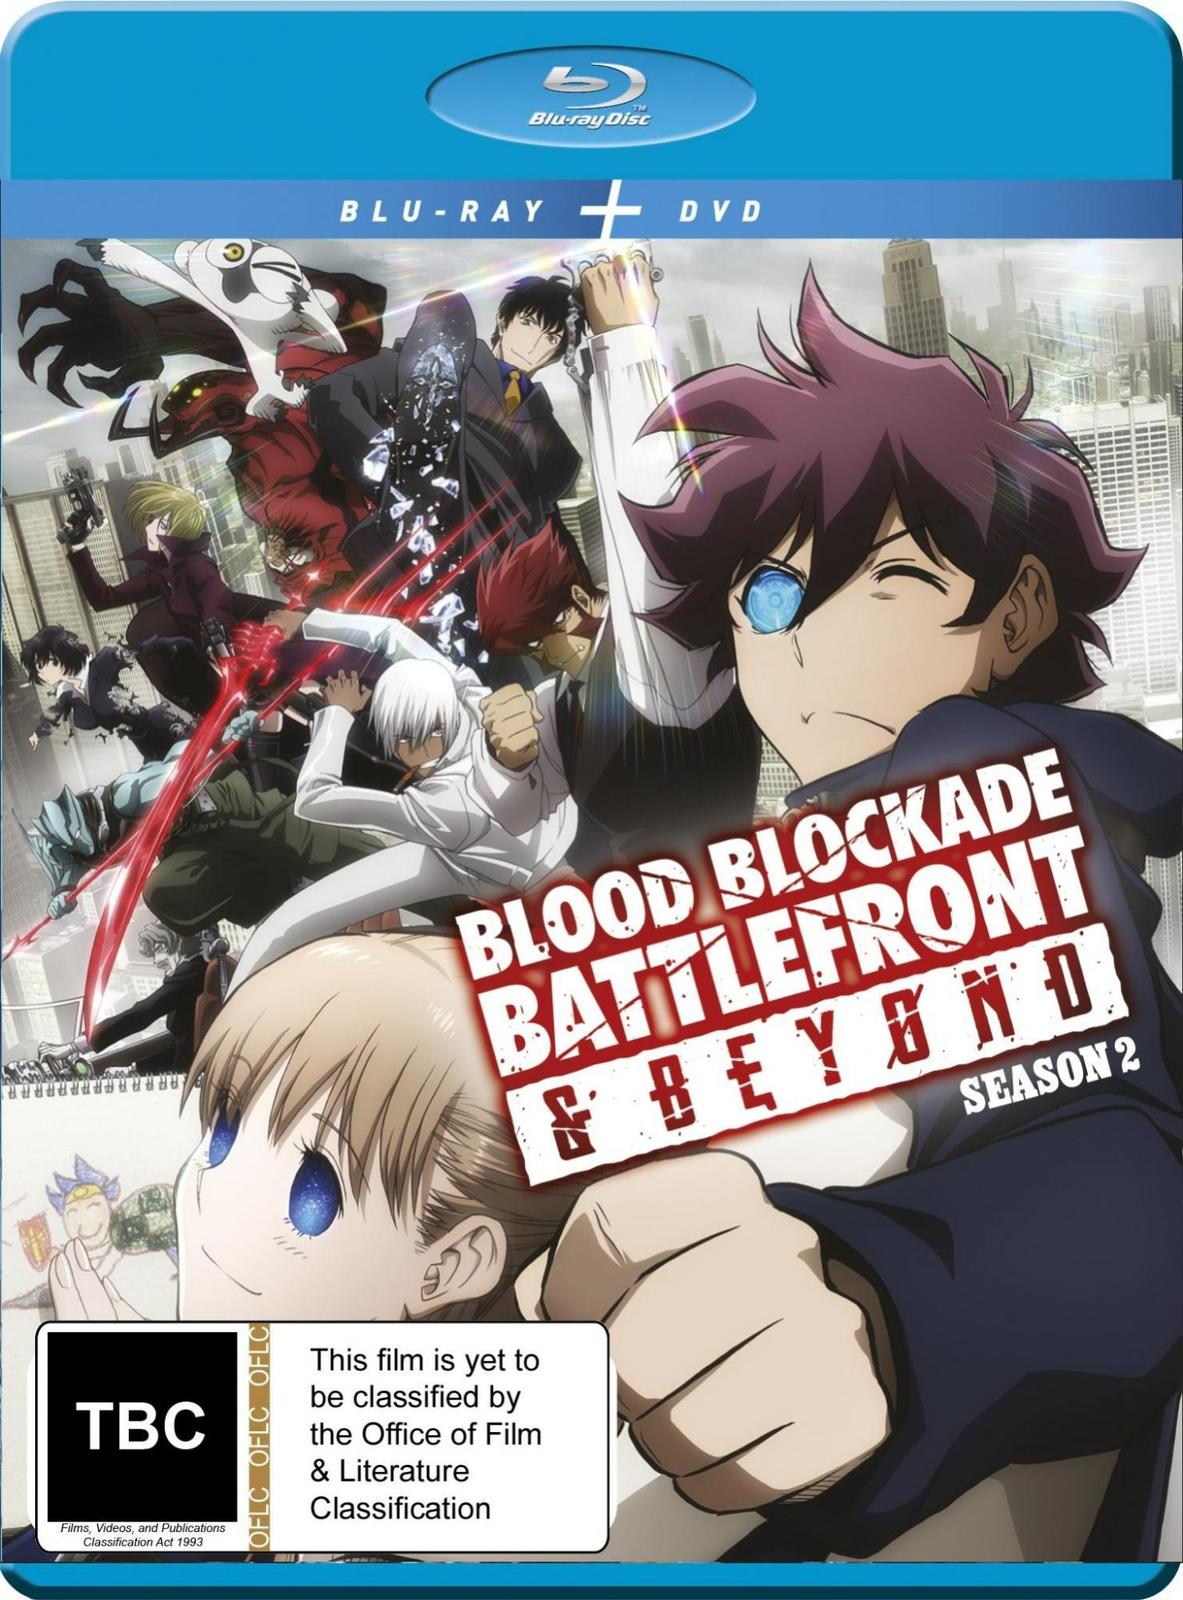 Blood Blockade Battlefront & Beyond: Season 2 on DVD, Blu-ray image